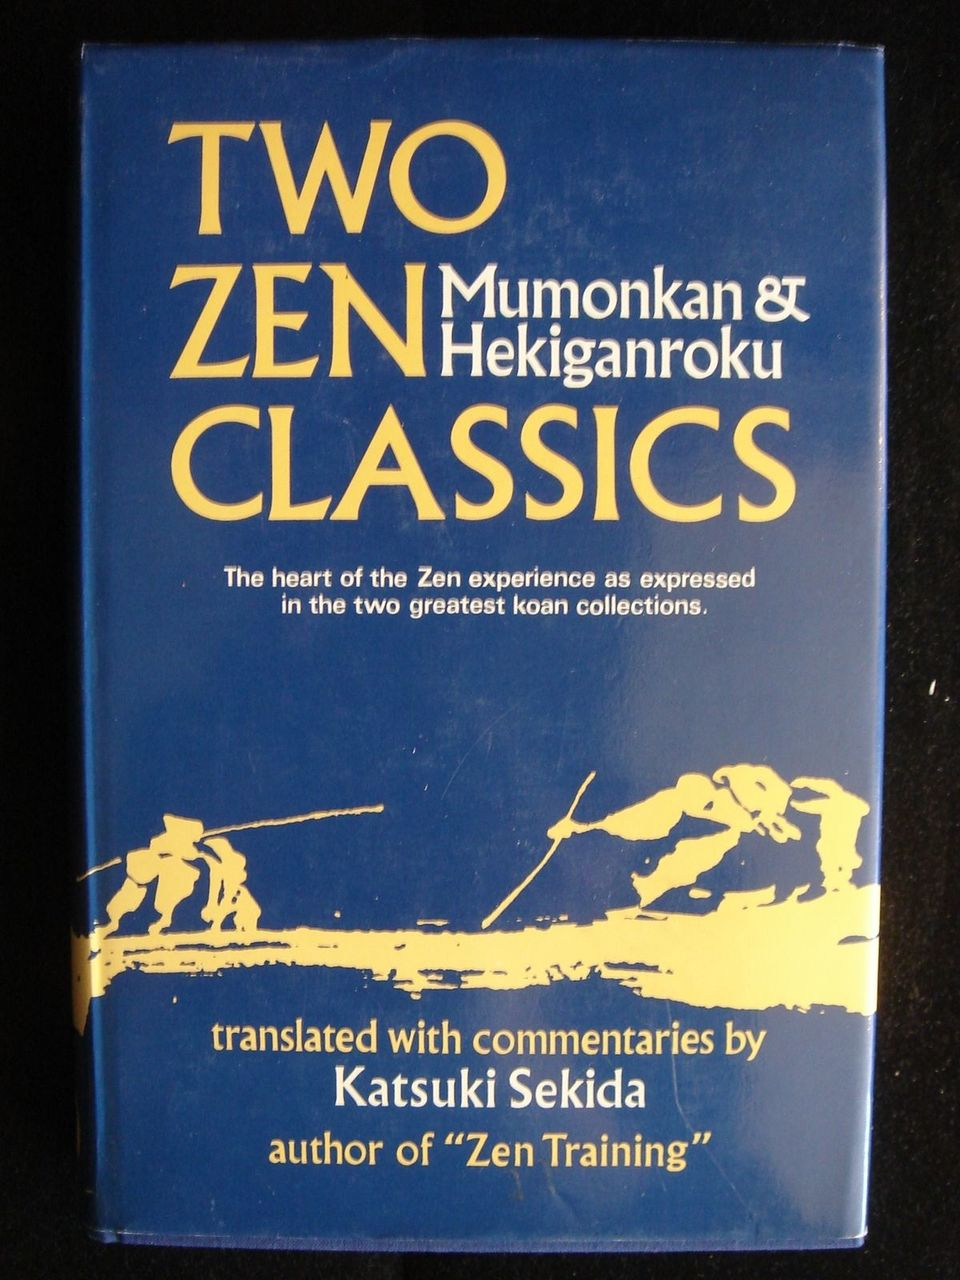 TWO ZEN CLASSICS, by Momonkan & Hekiganroku - 1977 [1st Ed]